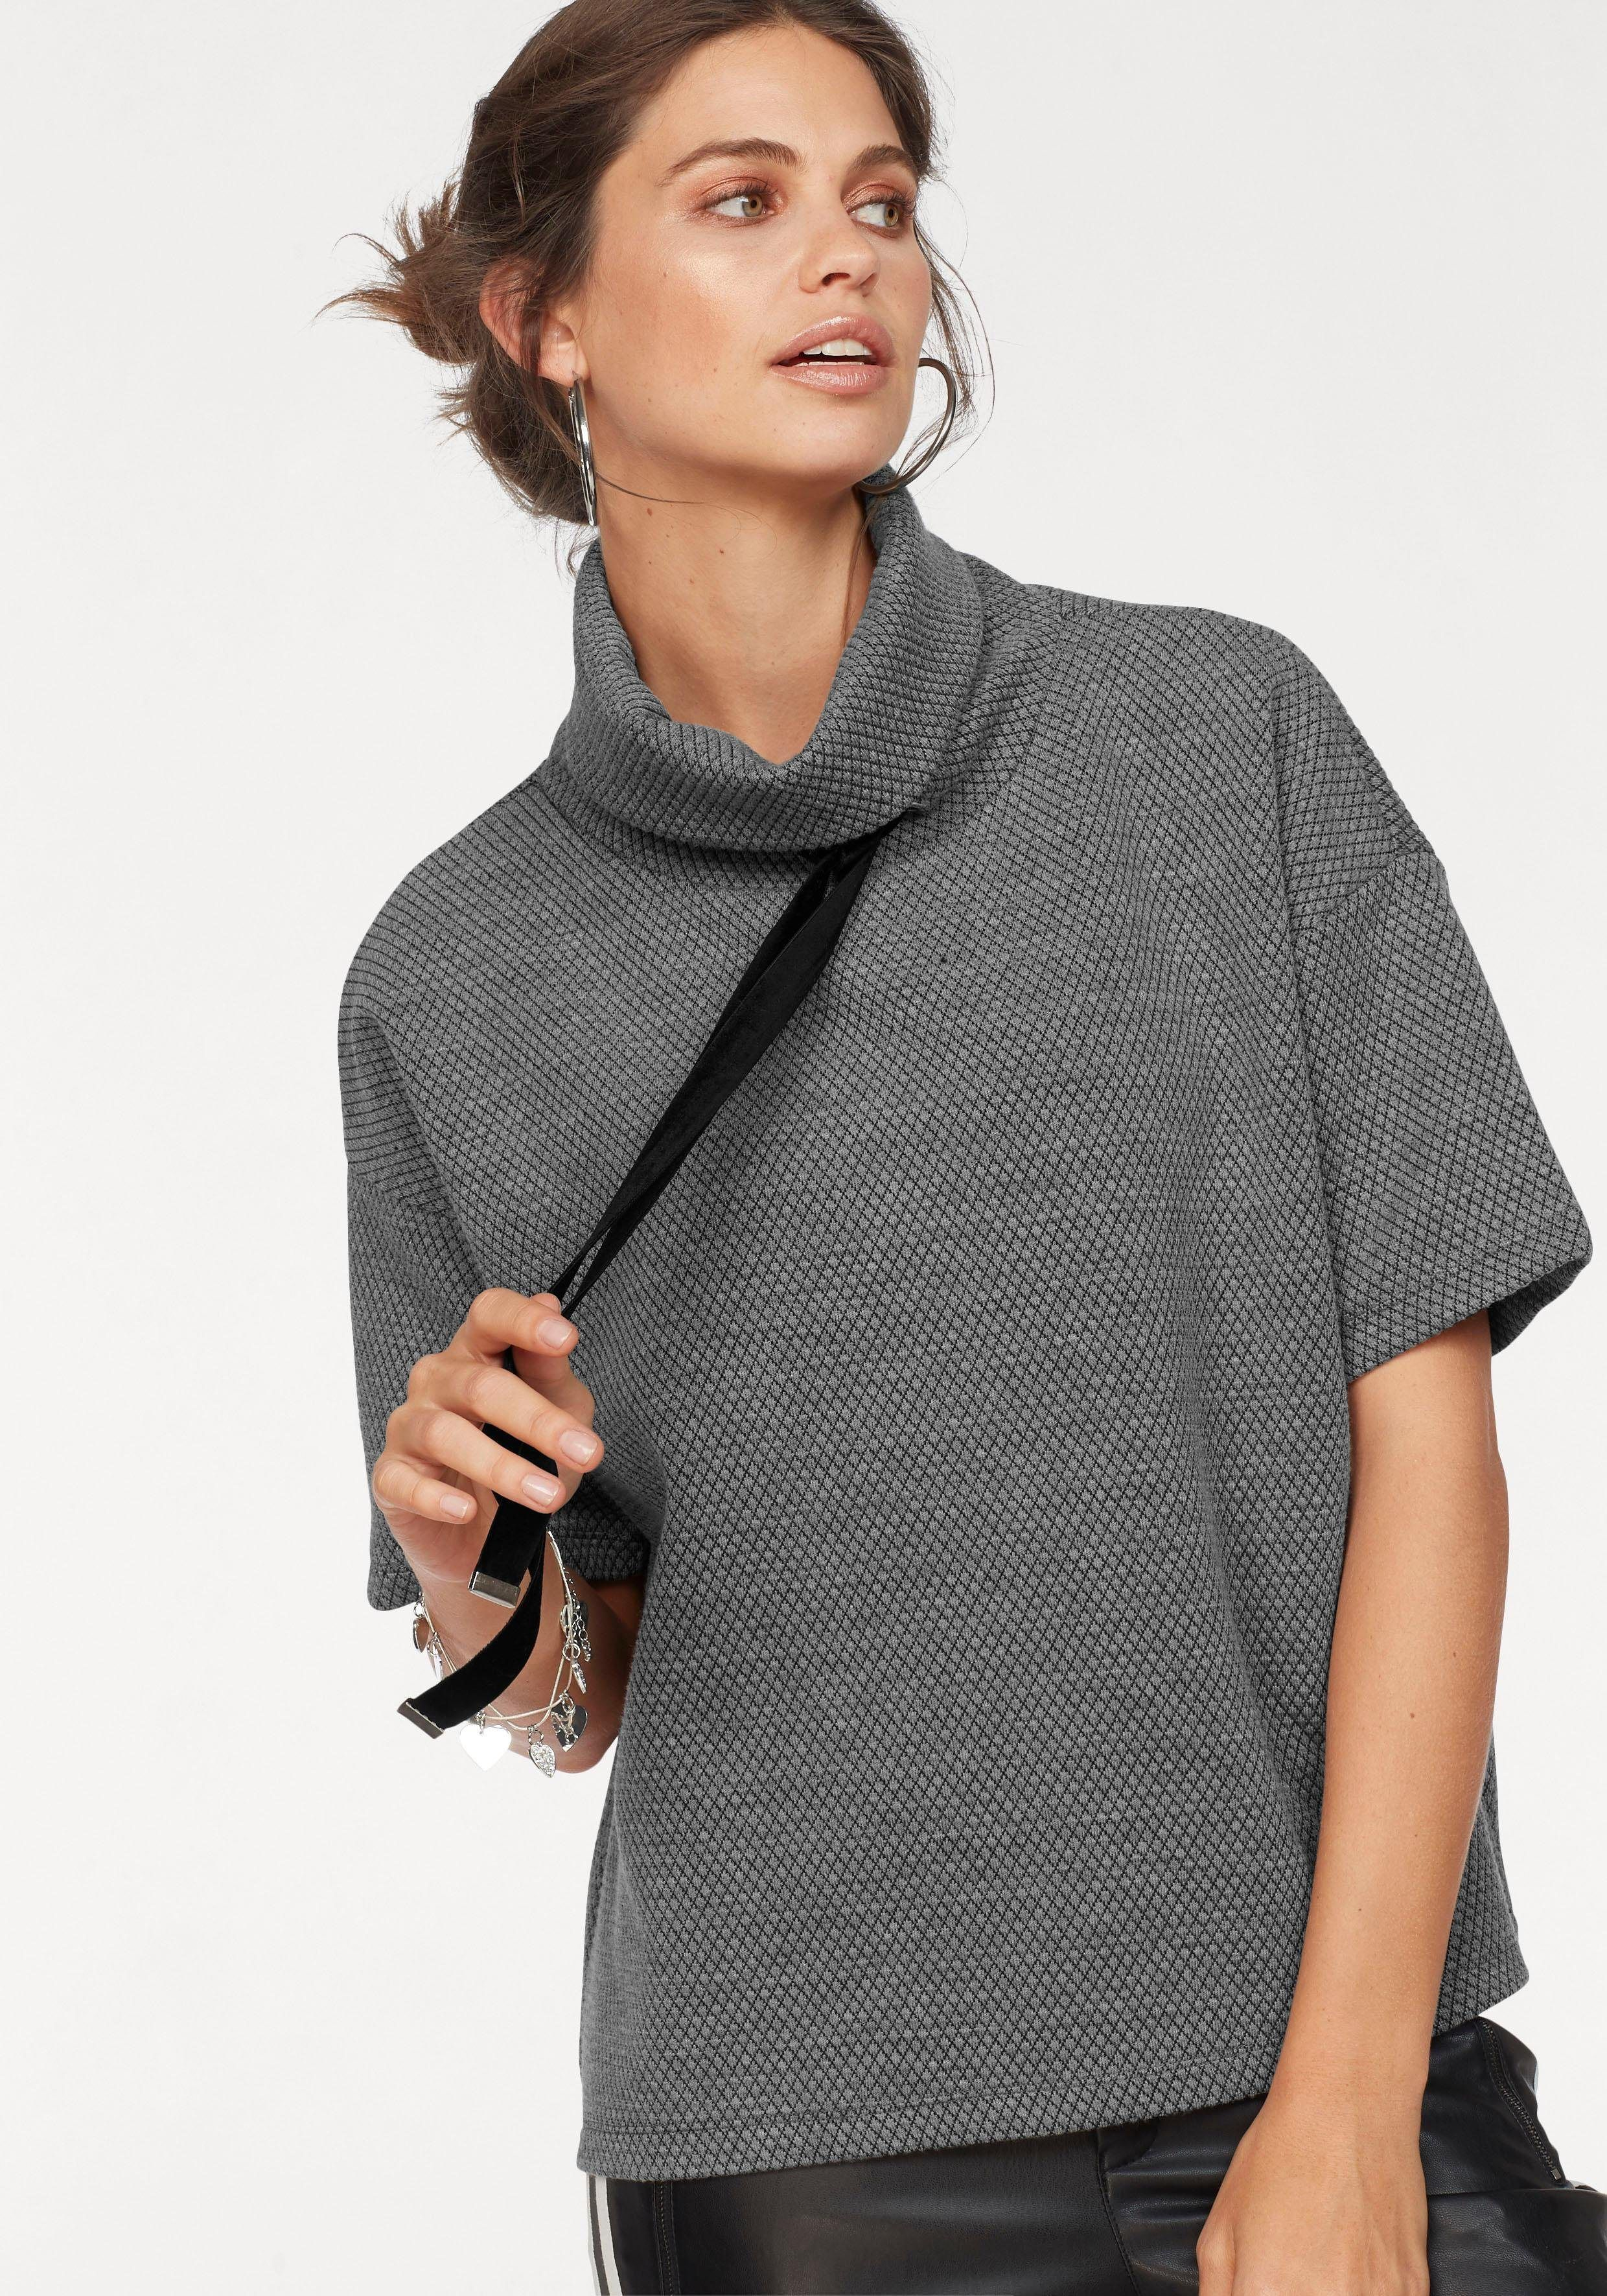 02316552618b48 #OTTO #Mona #Bekleidung #Pullover #Sale #Damen #Monari #Kurzarmpullover